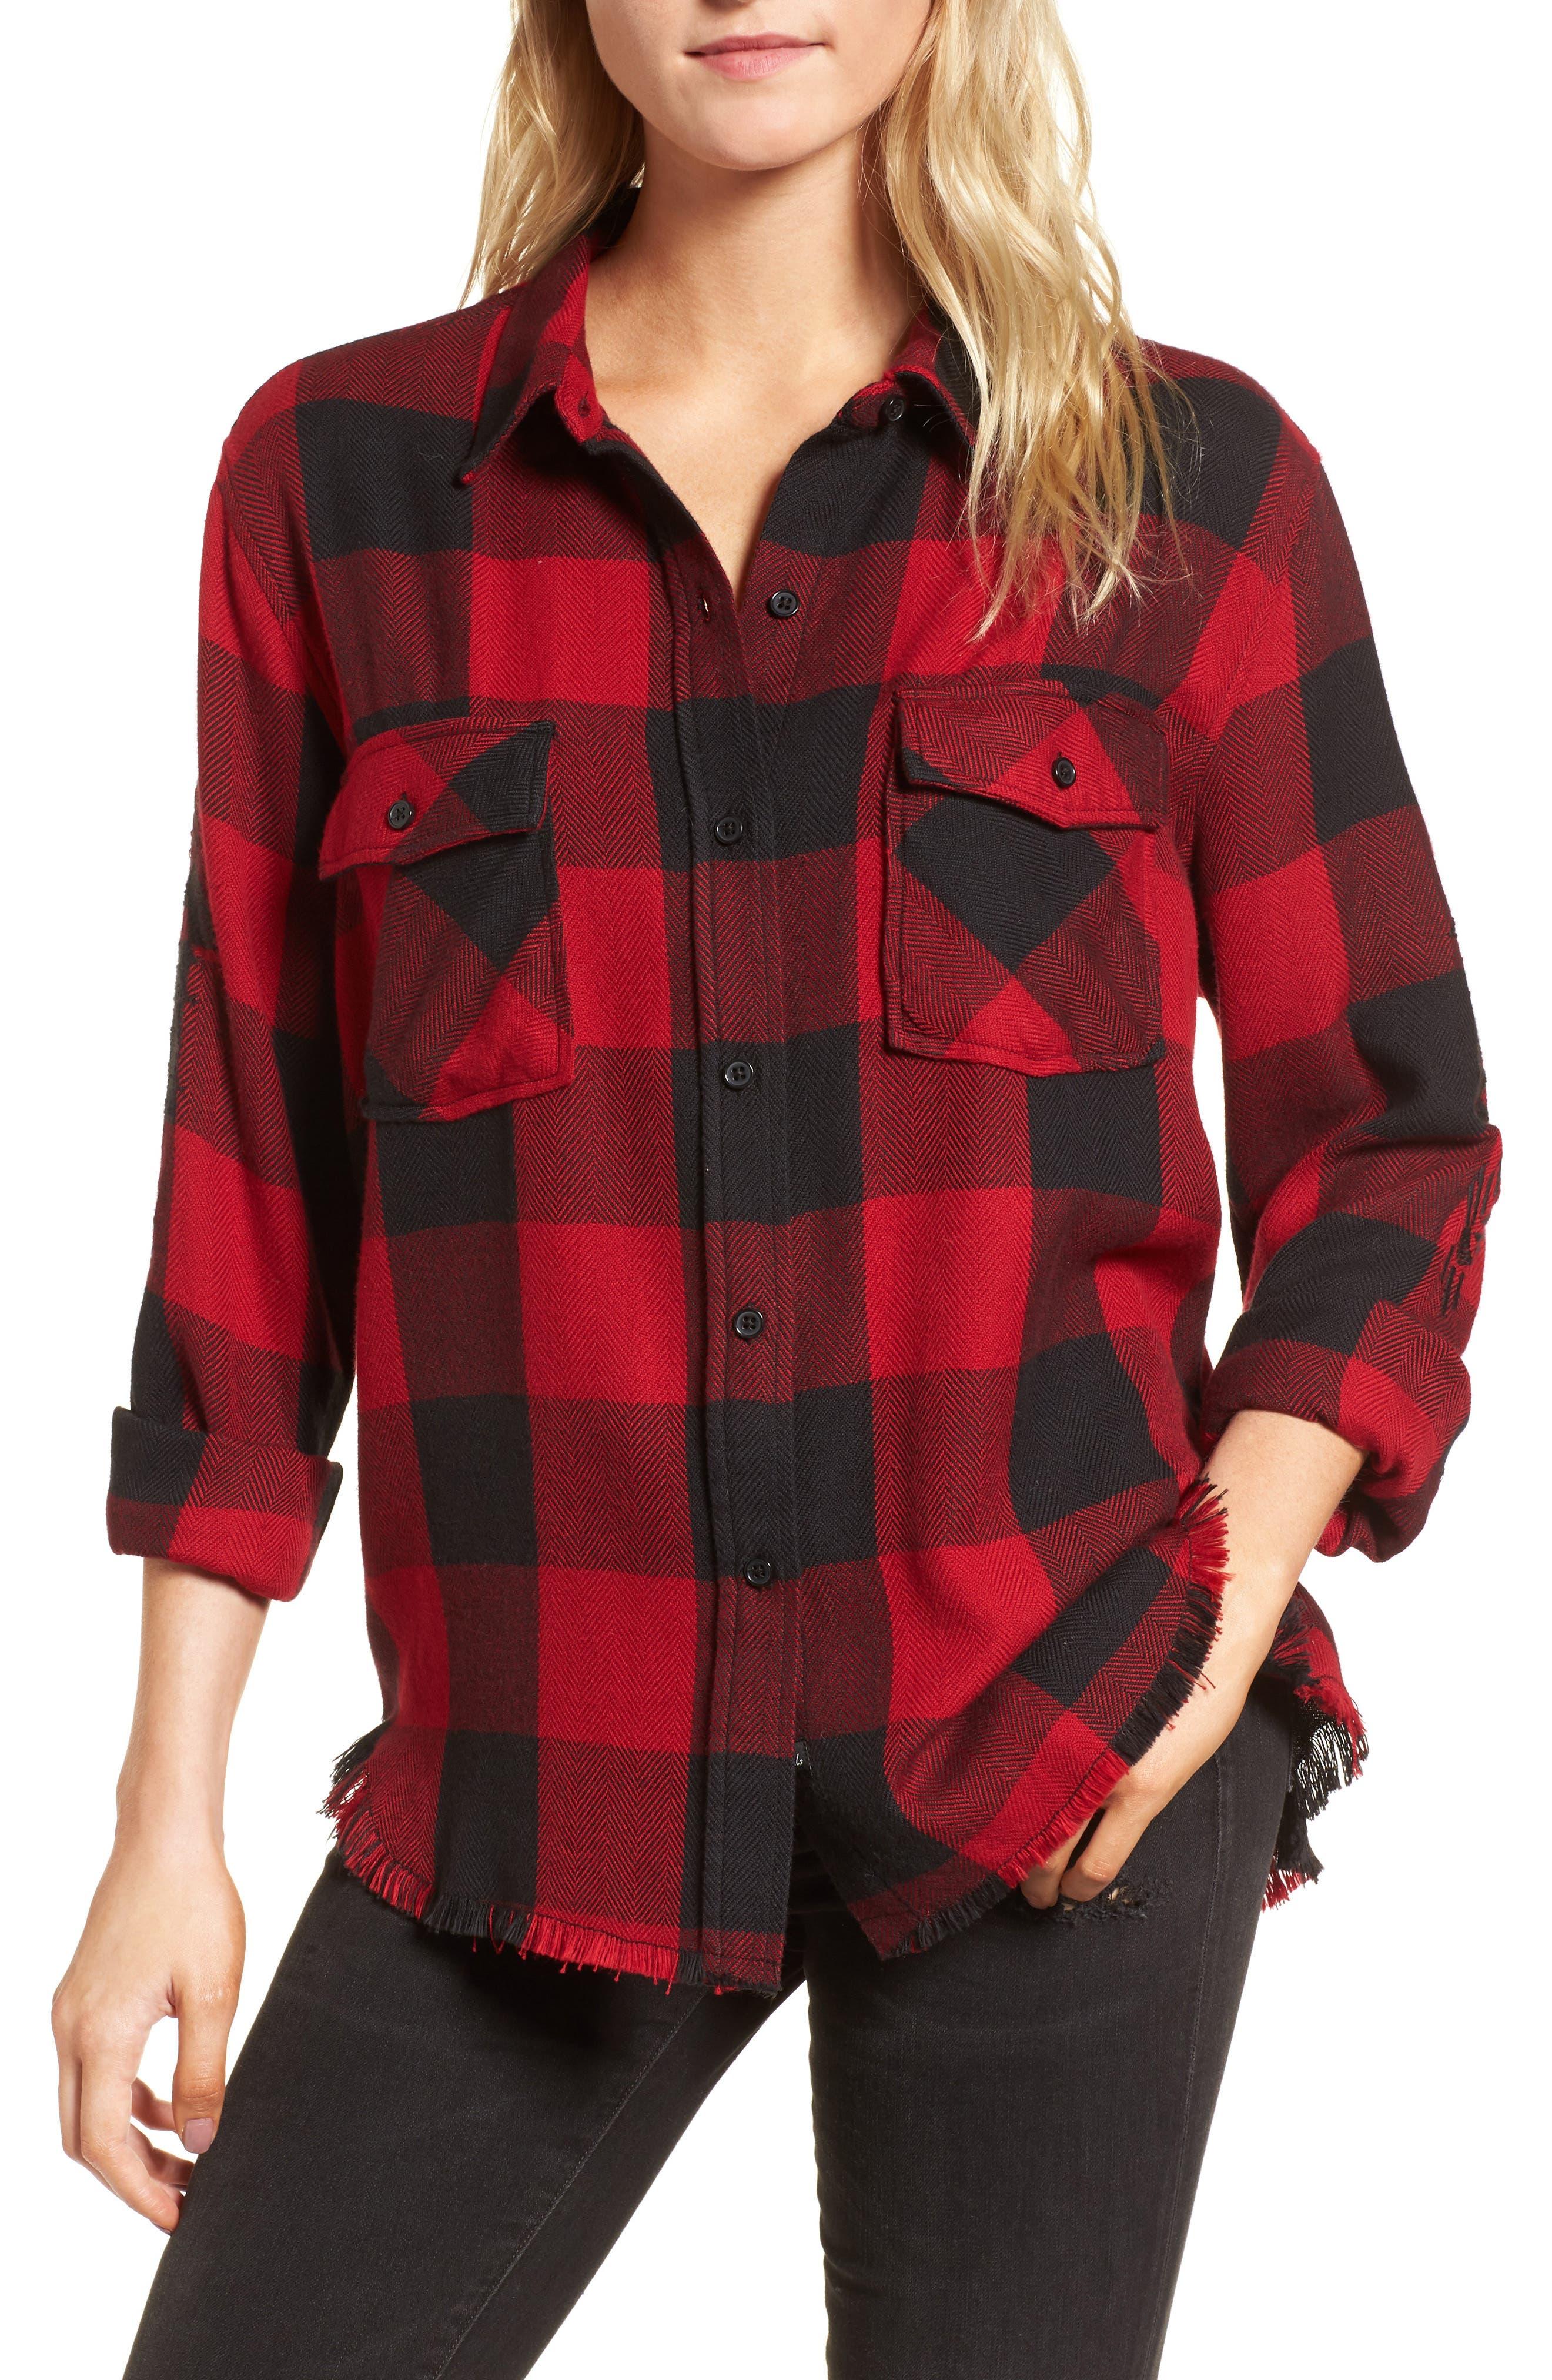 Larsson Embroidered Flannel Shirt,                         Main,                         color, Crimson Jet